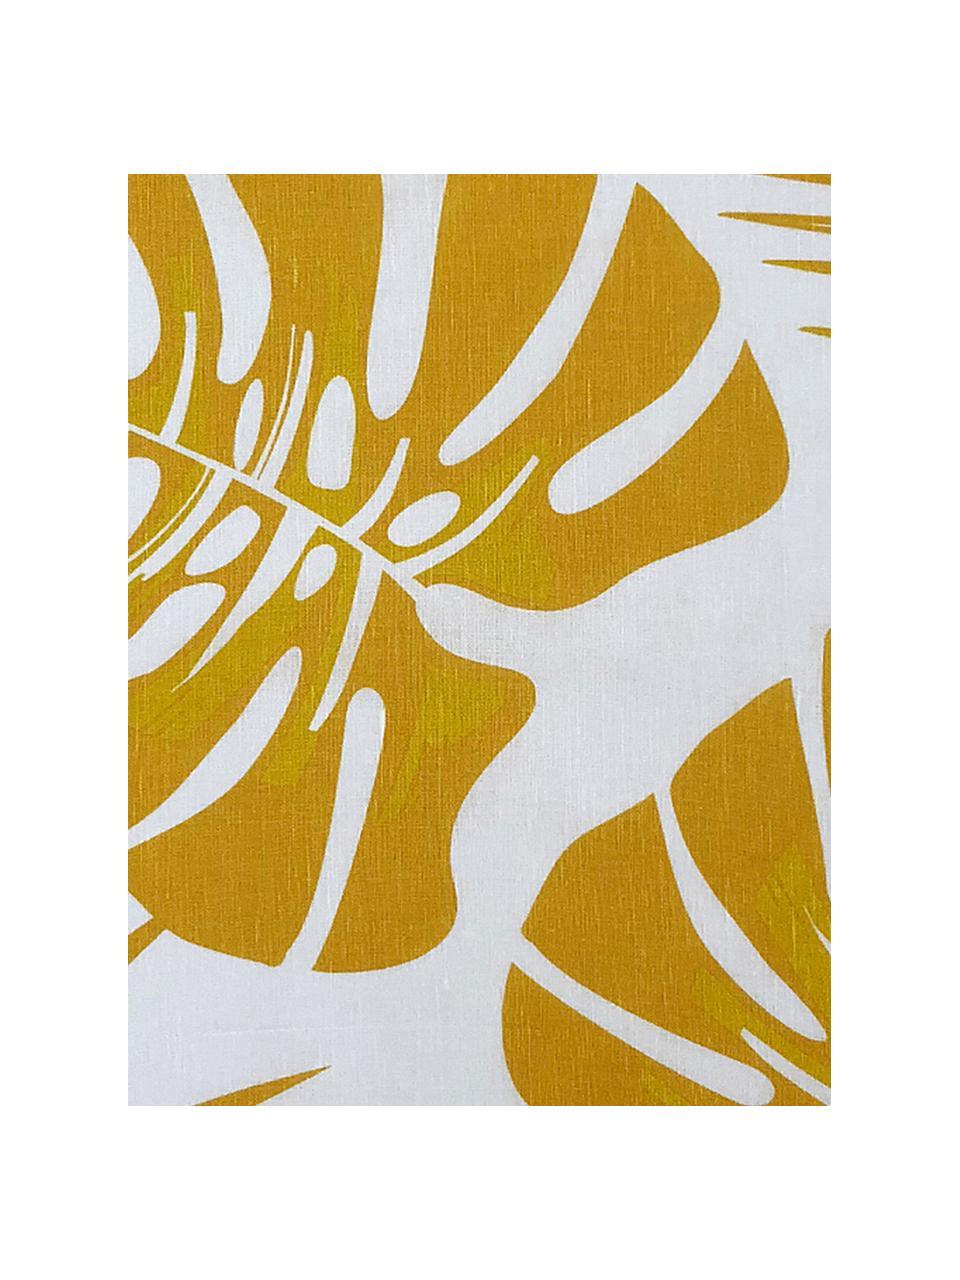 Halbleinen-Geschirrtücher Urban Jungle, 2 Stück, 50% Leinen, 50% Baumwolle, Weiß, Gelb, 50 x 70 cm